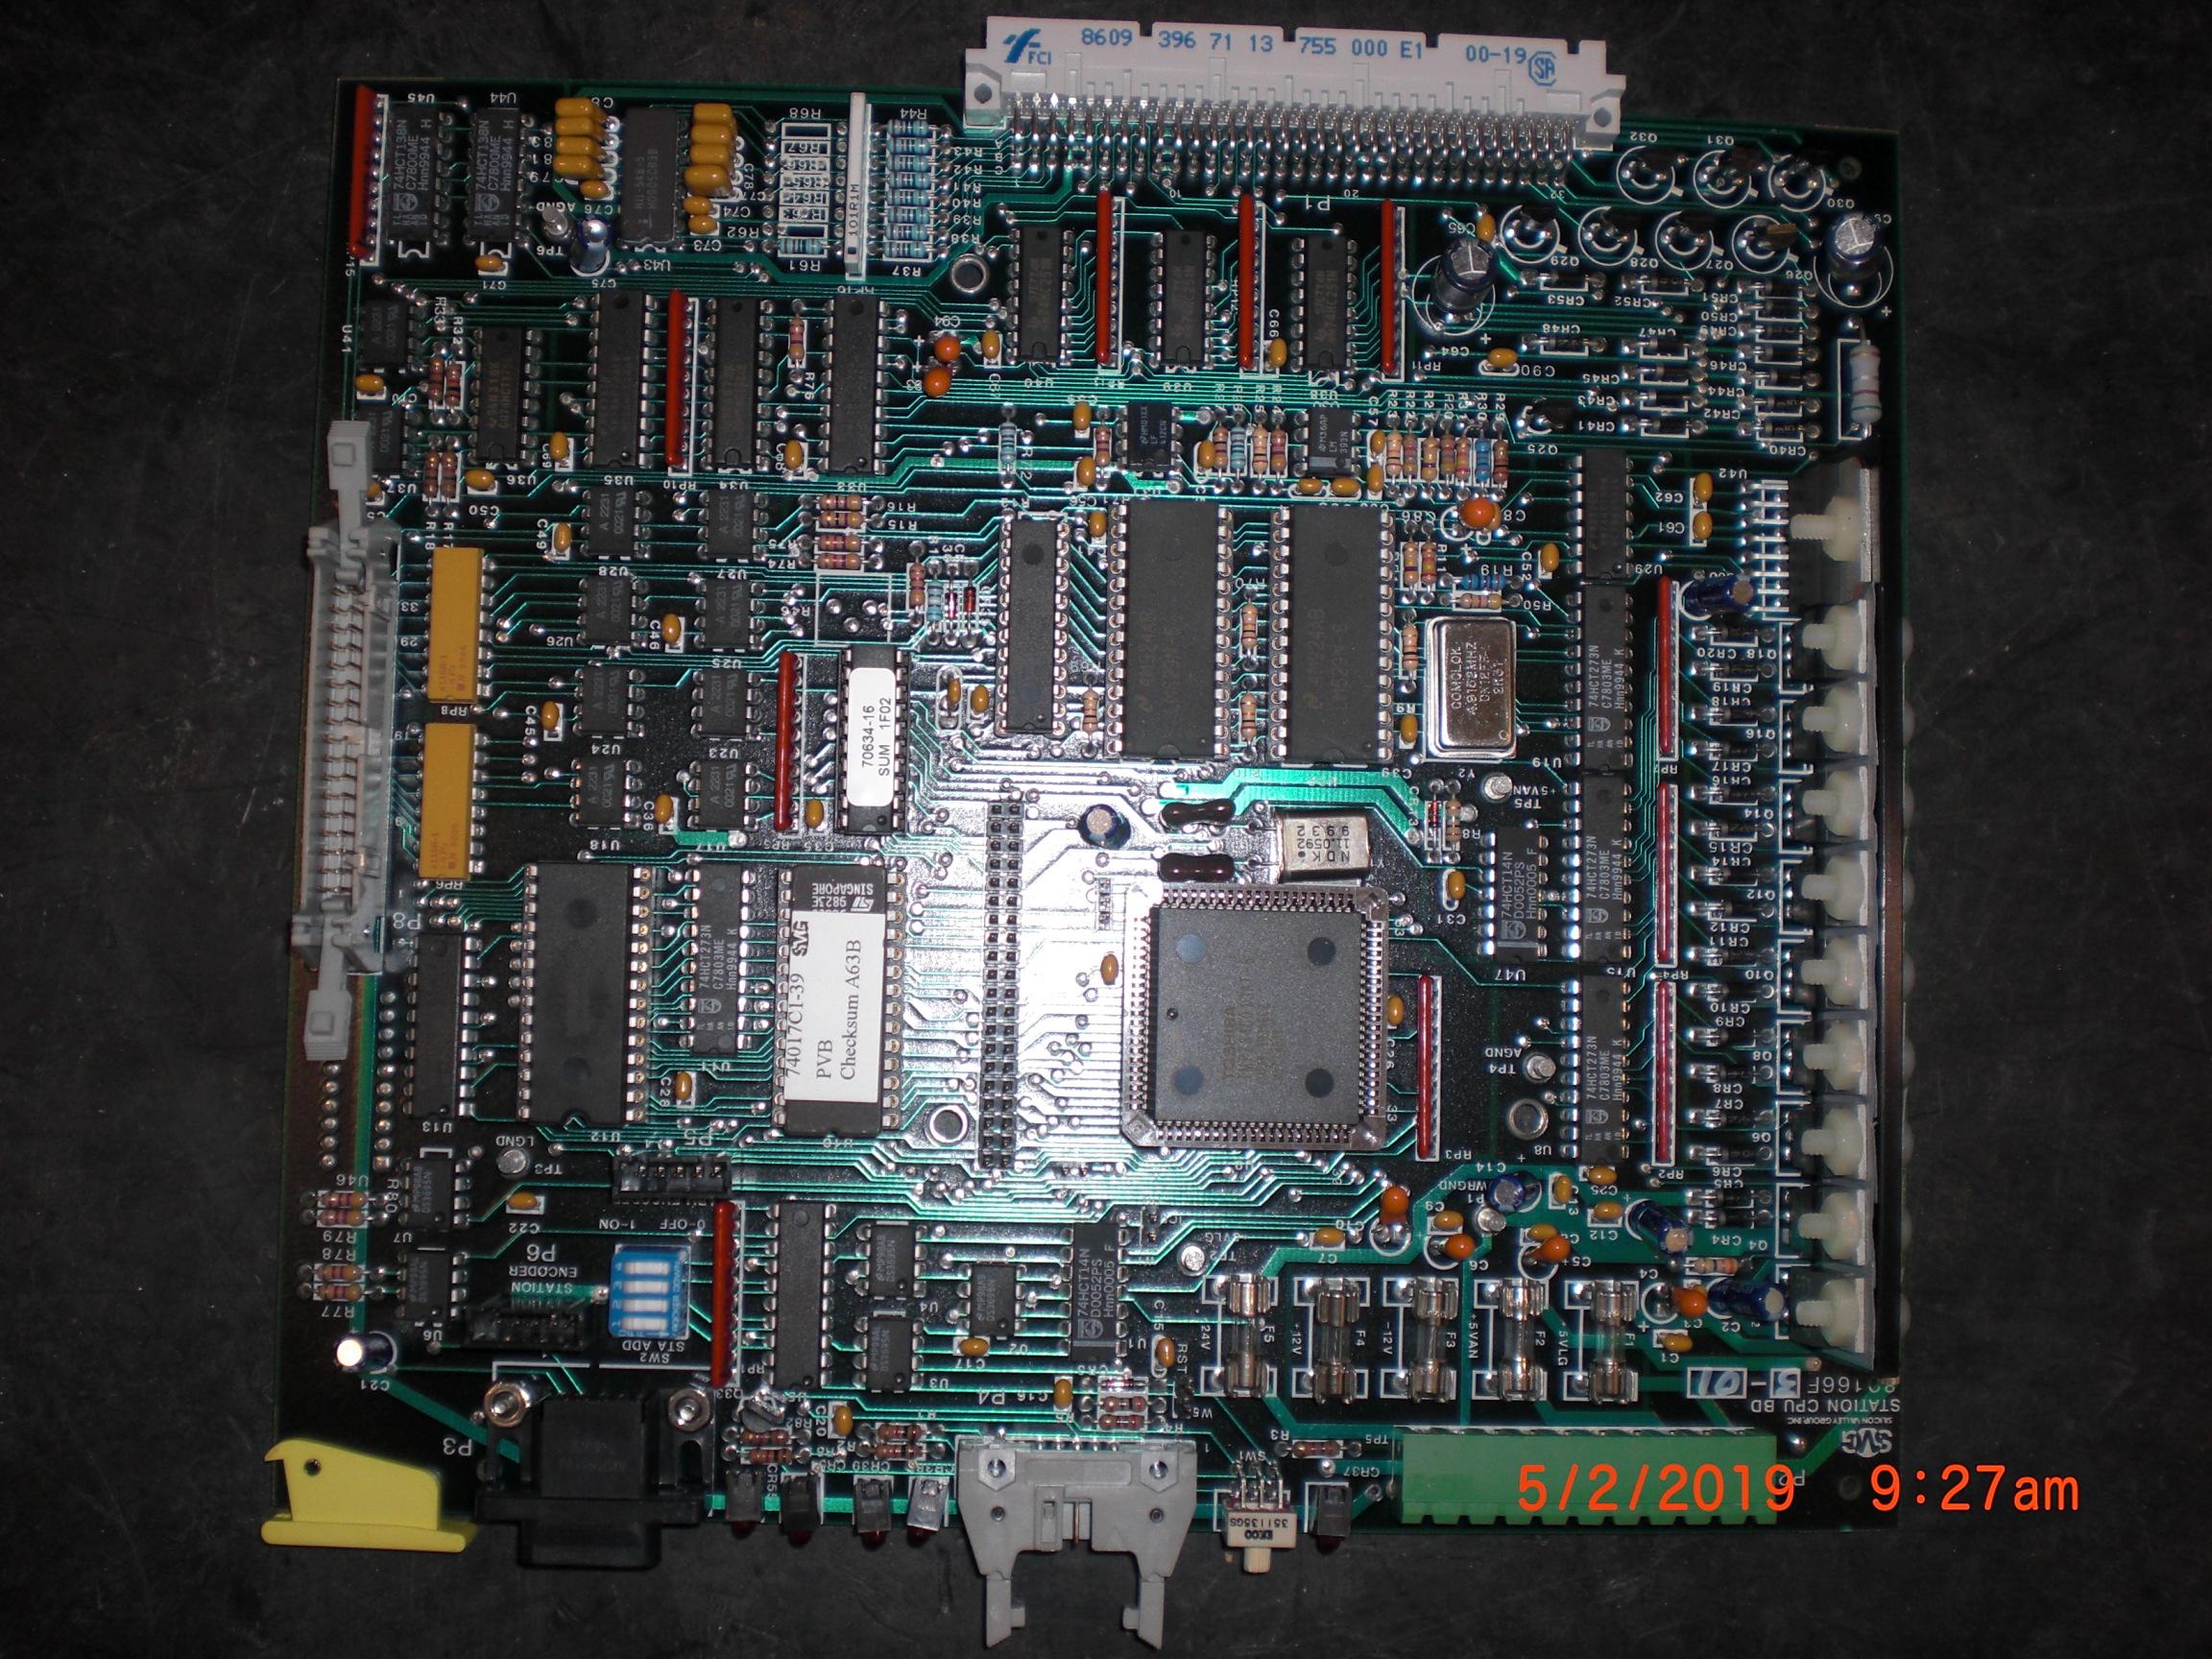 PCB SVG 99-80166F3-01 Station CPU BD